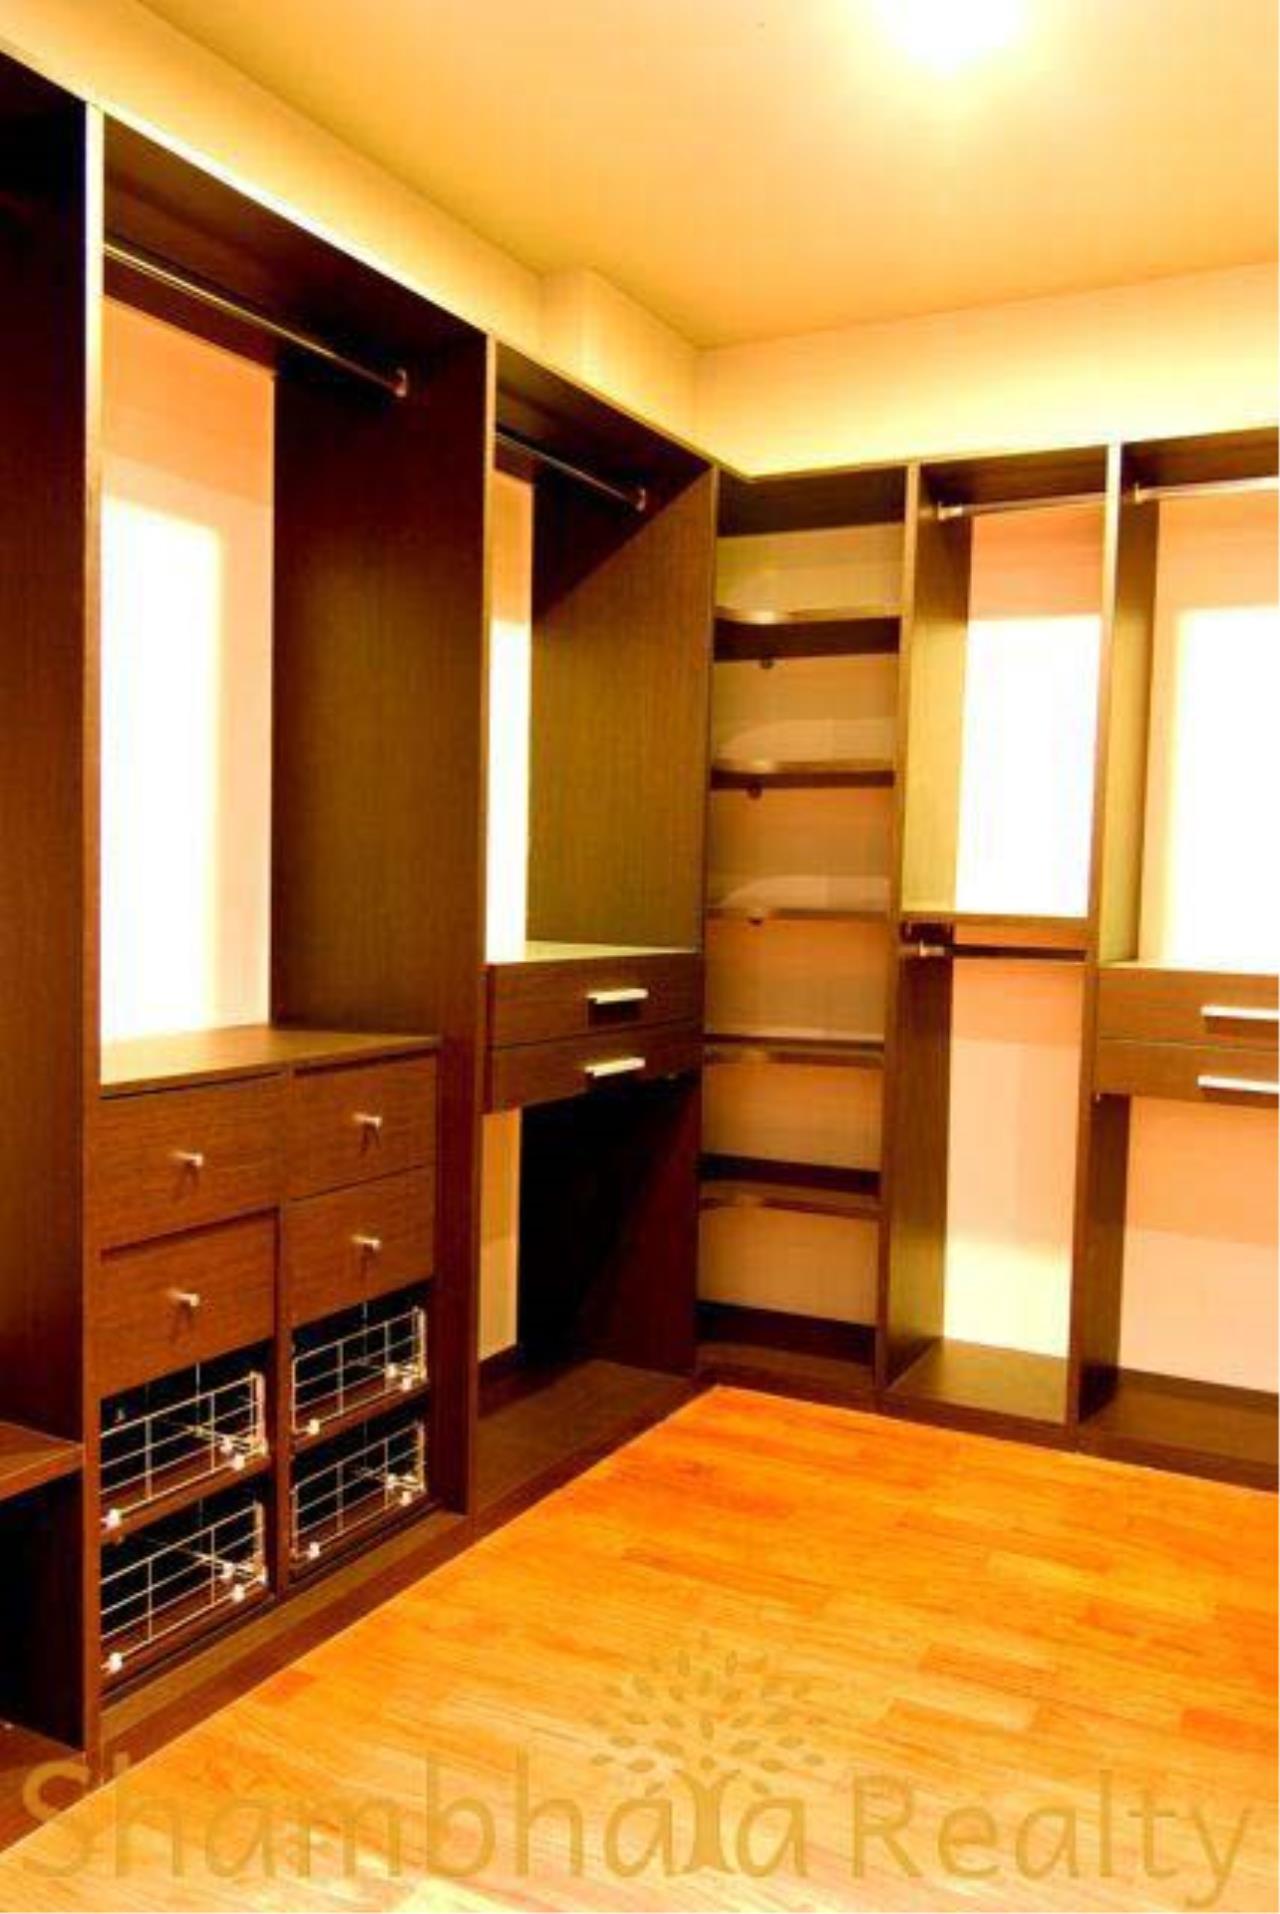 Shambhala Realty Agency's House for rent at Sukhumvit 34 Condominium for Rent in Sukhumvit 34 2